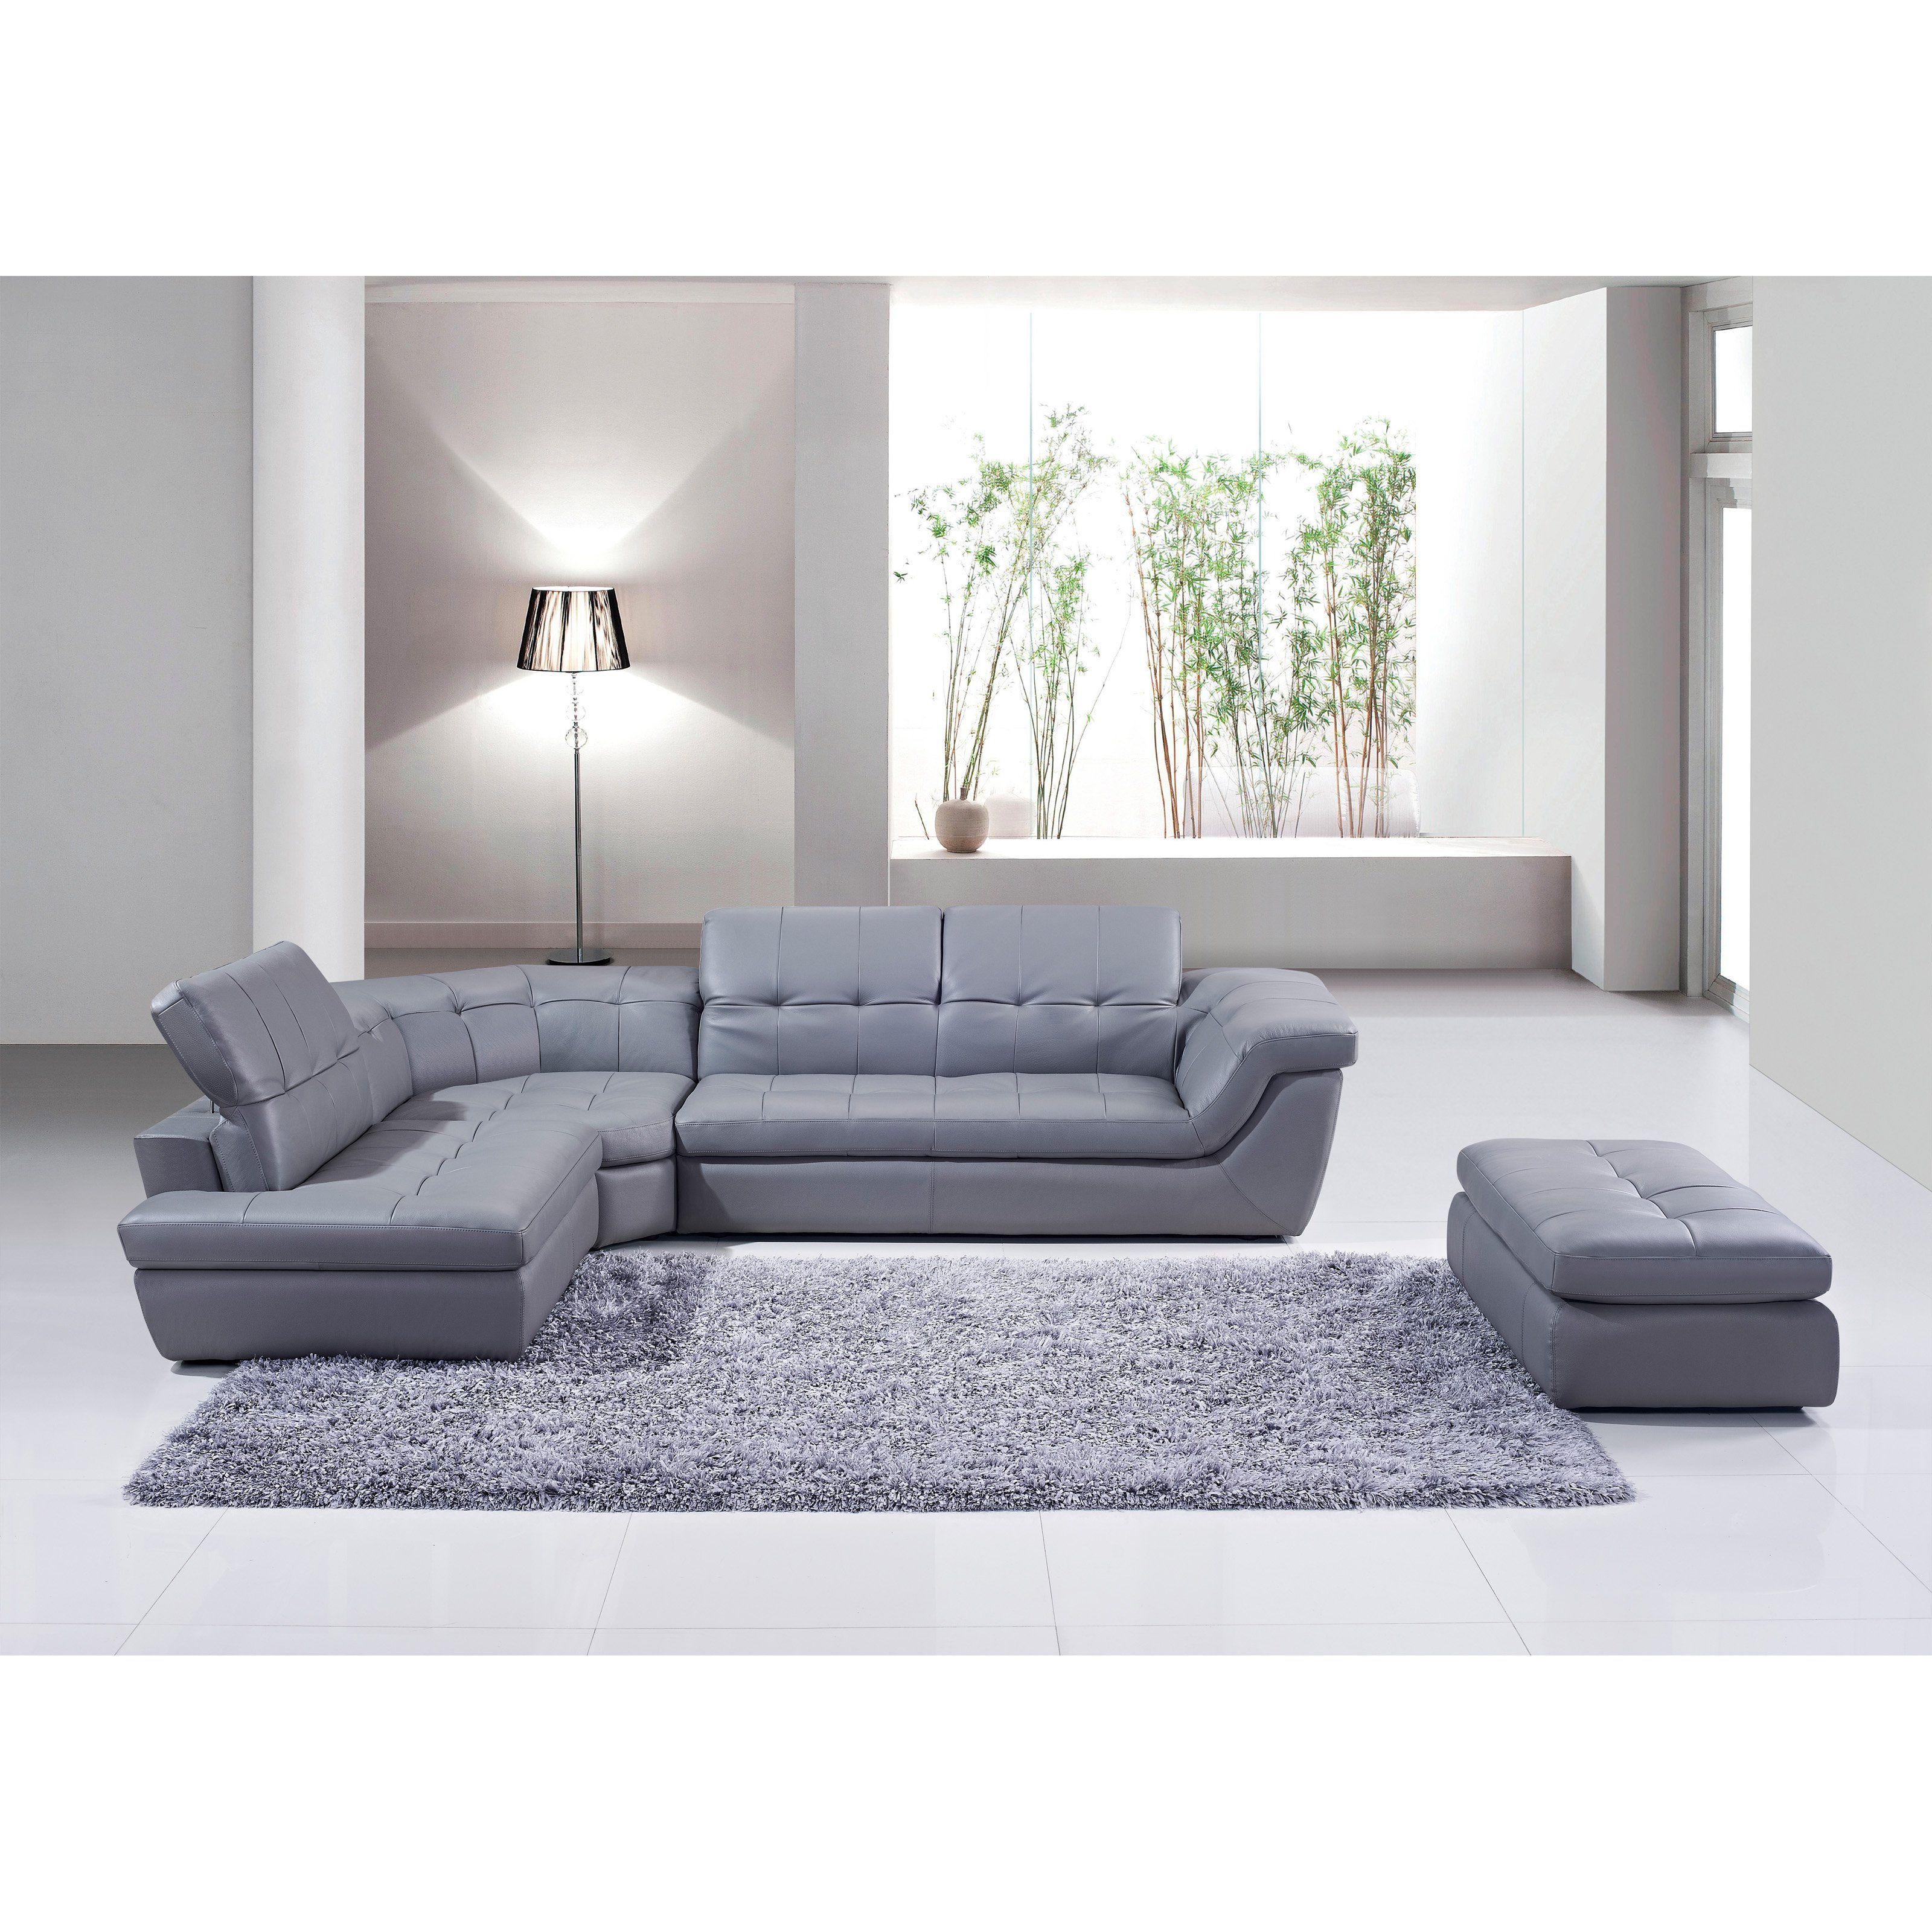 Strange Jm Furniture Lux 397 7576 Sectional Sofa 175442912 Rhfc Creativecarmelina Interior Chair Design Creativecarmelinacom